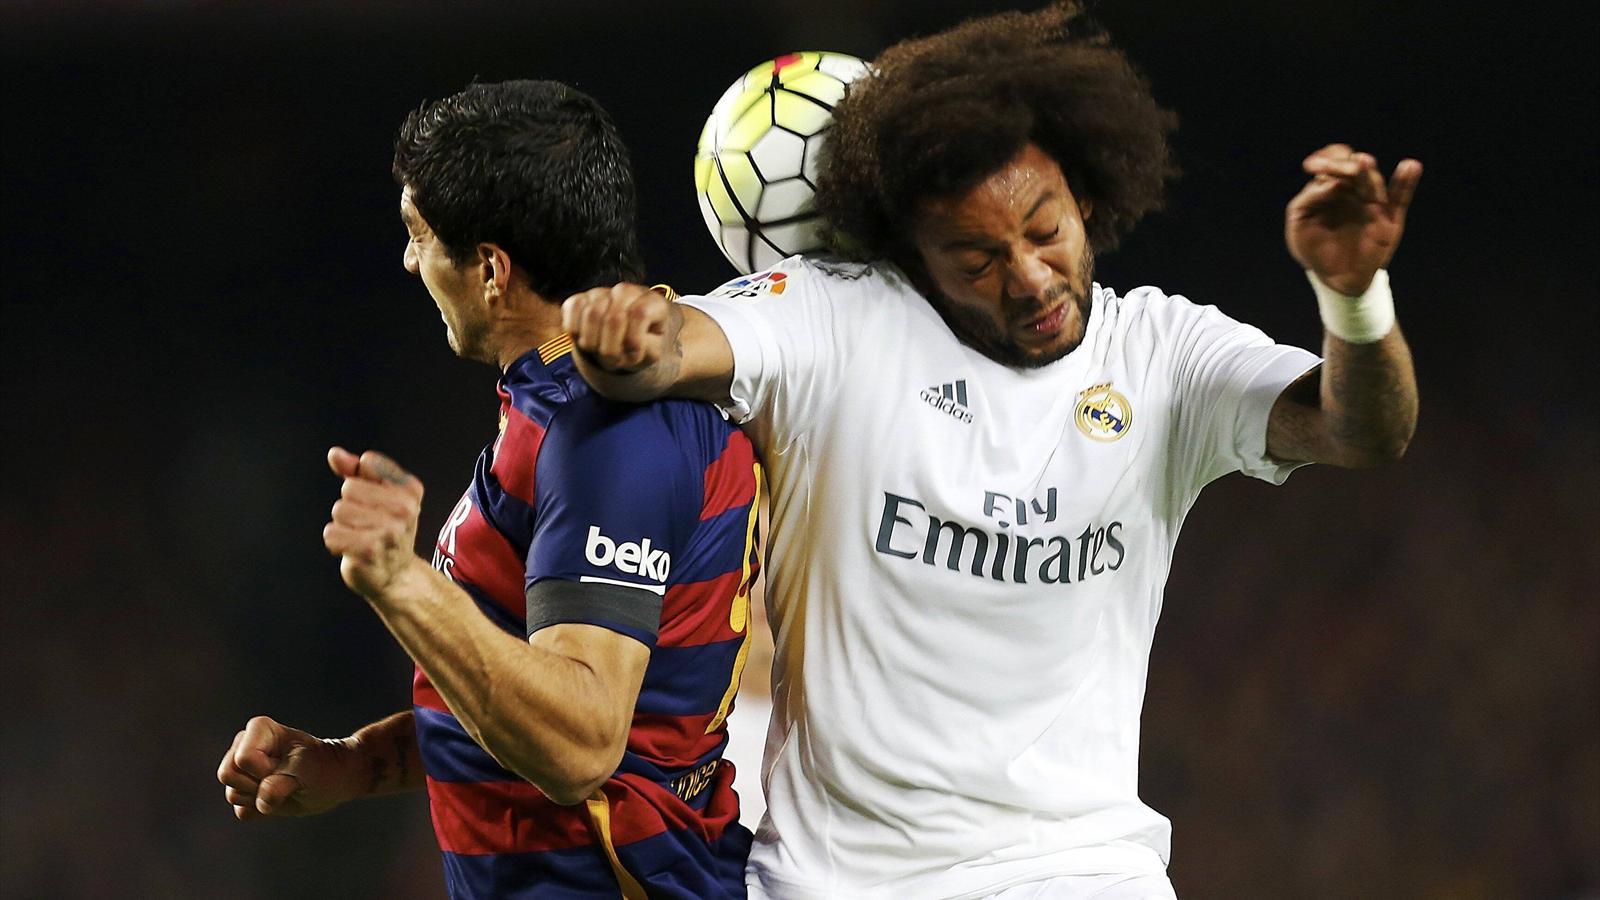 Barcelona vs real madrid d a hora y d nde televisan el for Televisan el madrid hoy